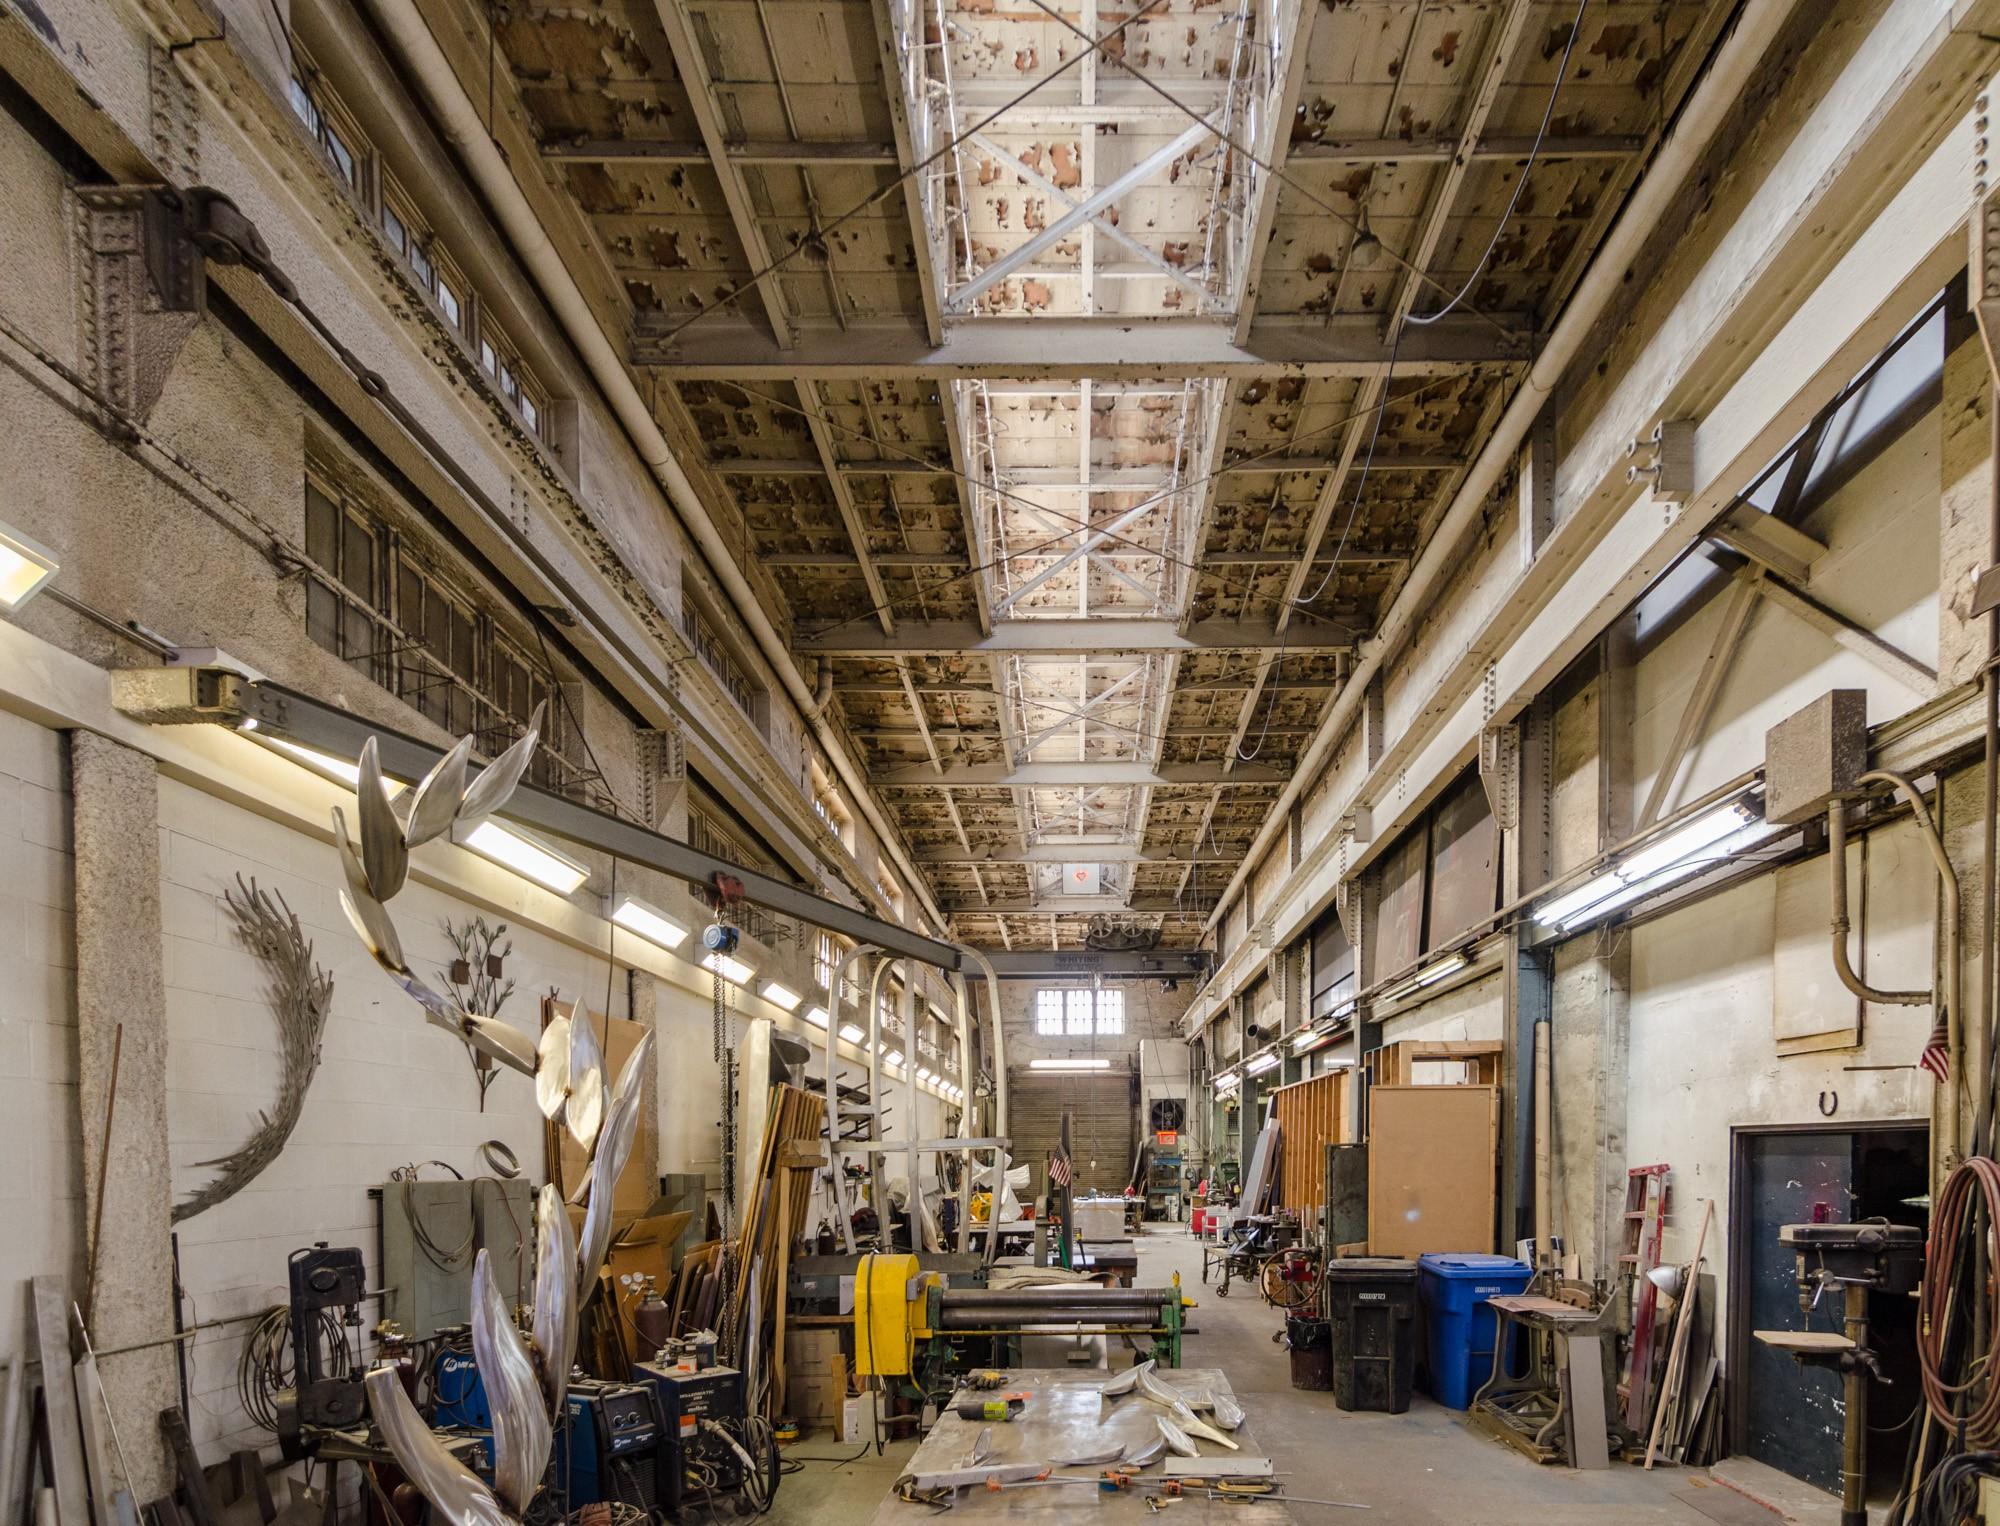 sedgwick studio sites open house chicago